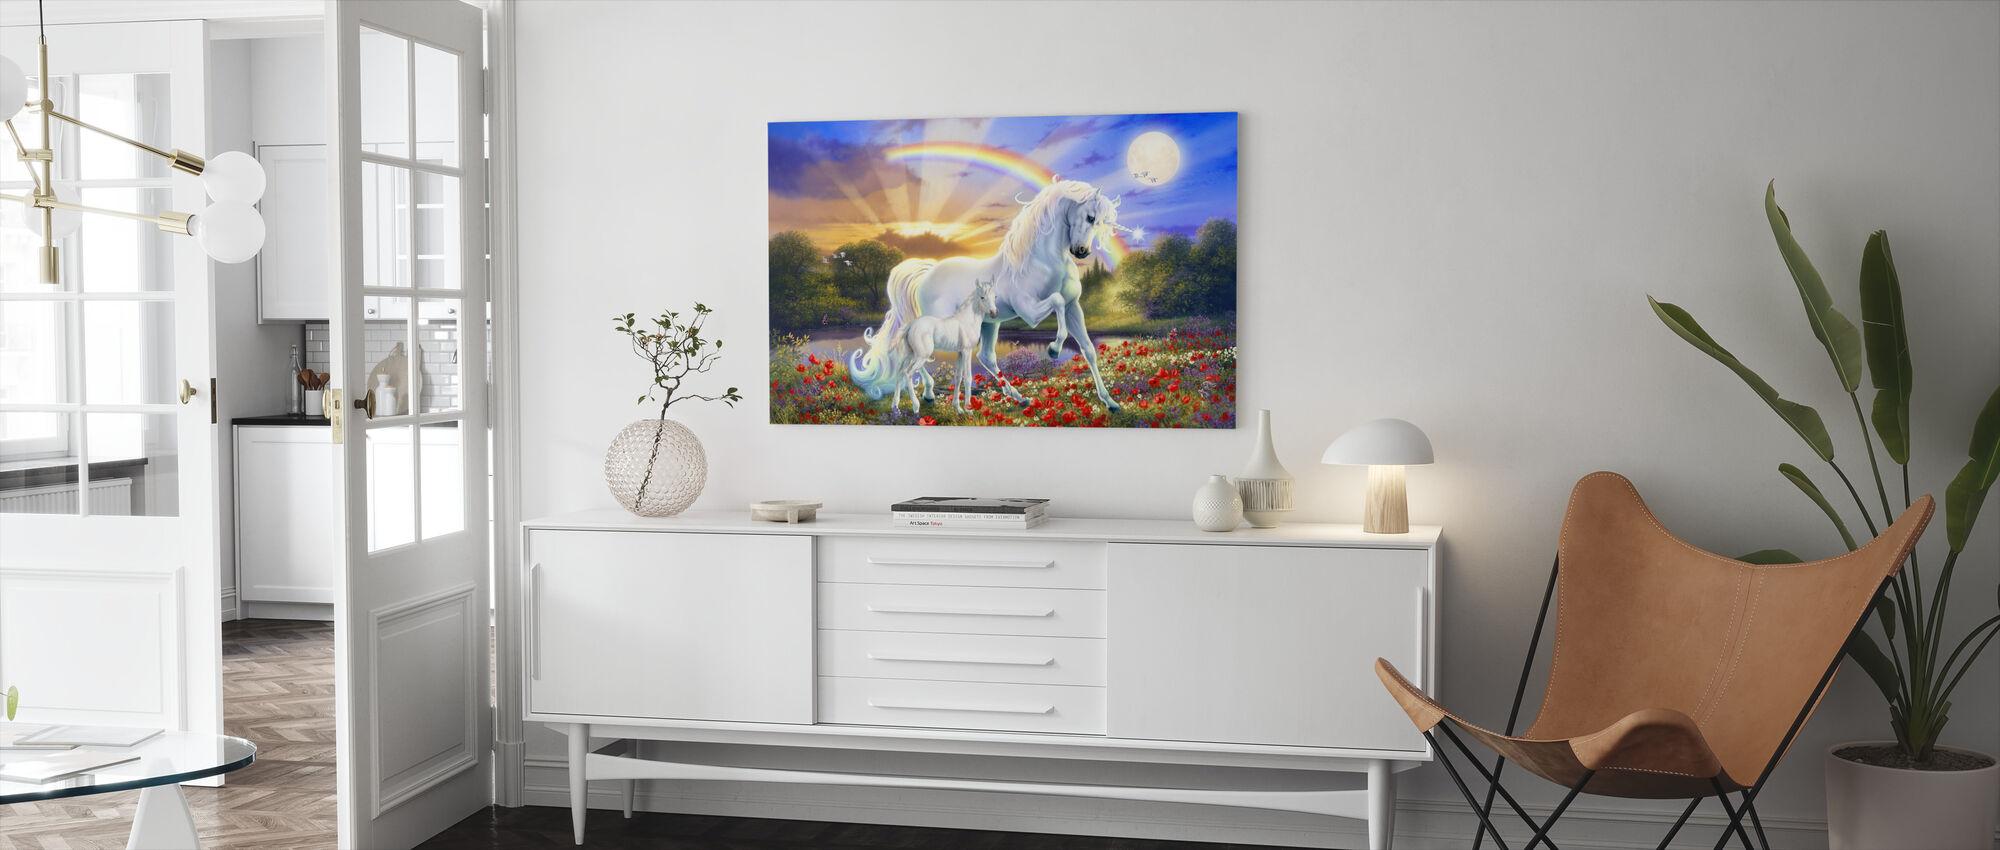 Rainbow Enhjørning - Lerretsbilde - Stue